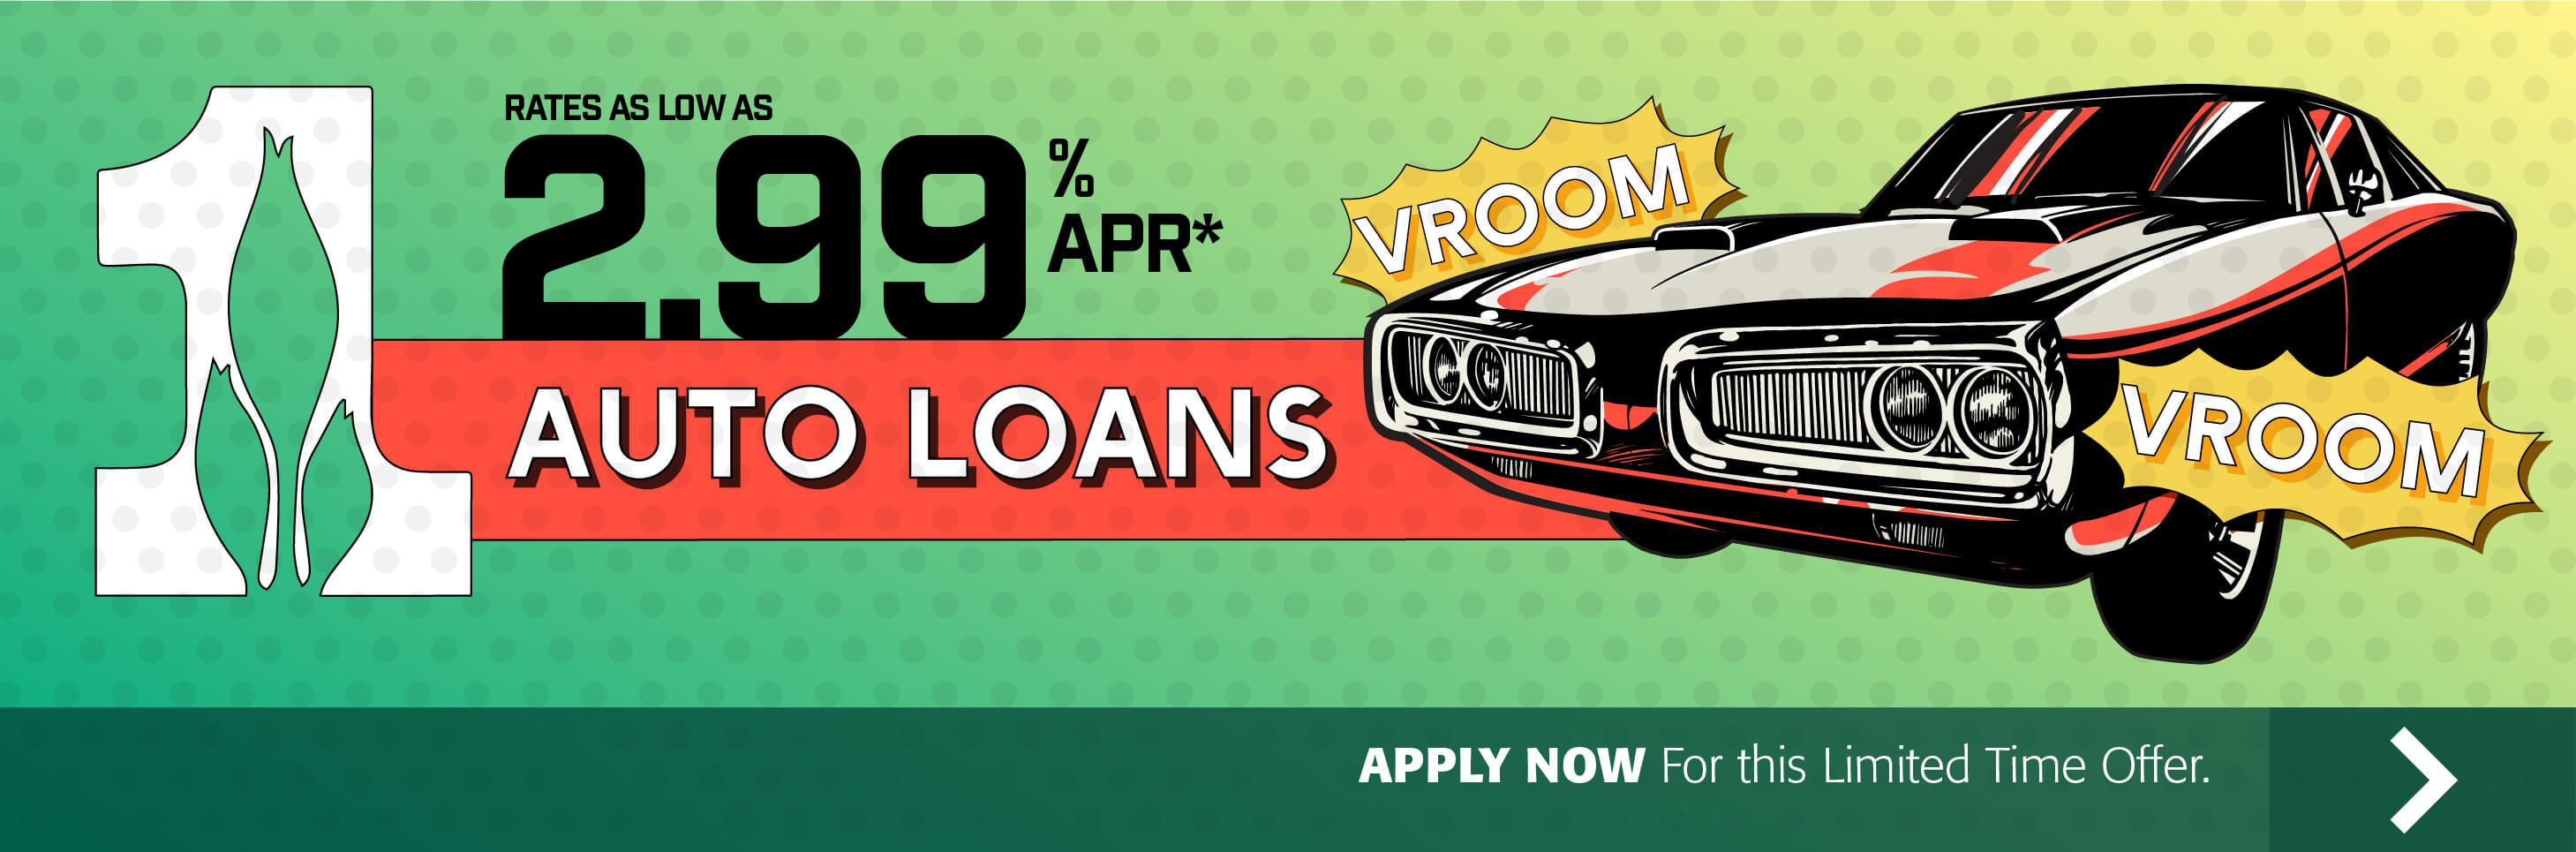 Auto Loans 2.99% APR*